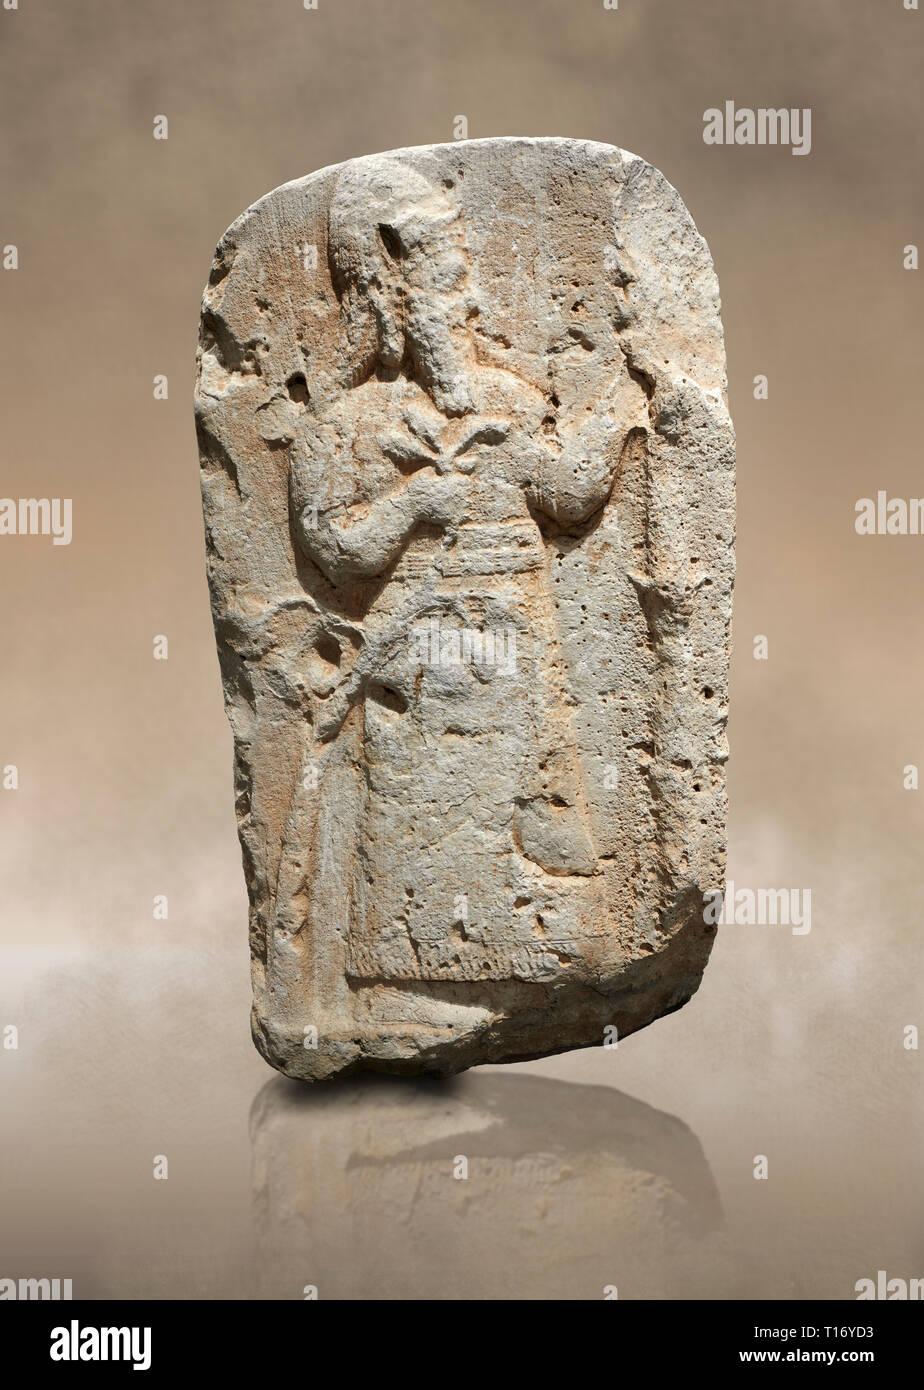 Hittite monumental relief sculpture of a lion. Late Hittite Period - 900-700 BC. Adana Archaeology Museum, Turkey. Stock Photo